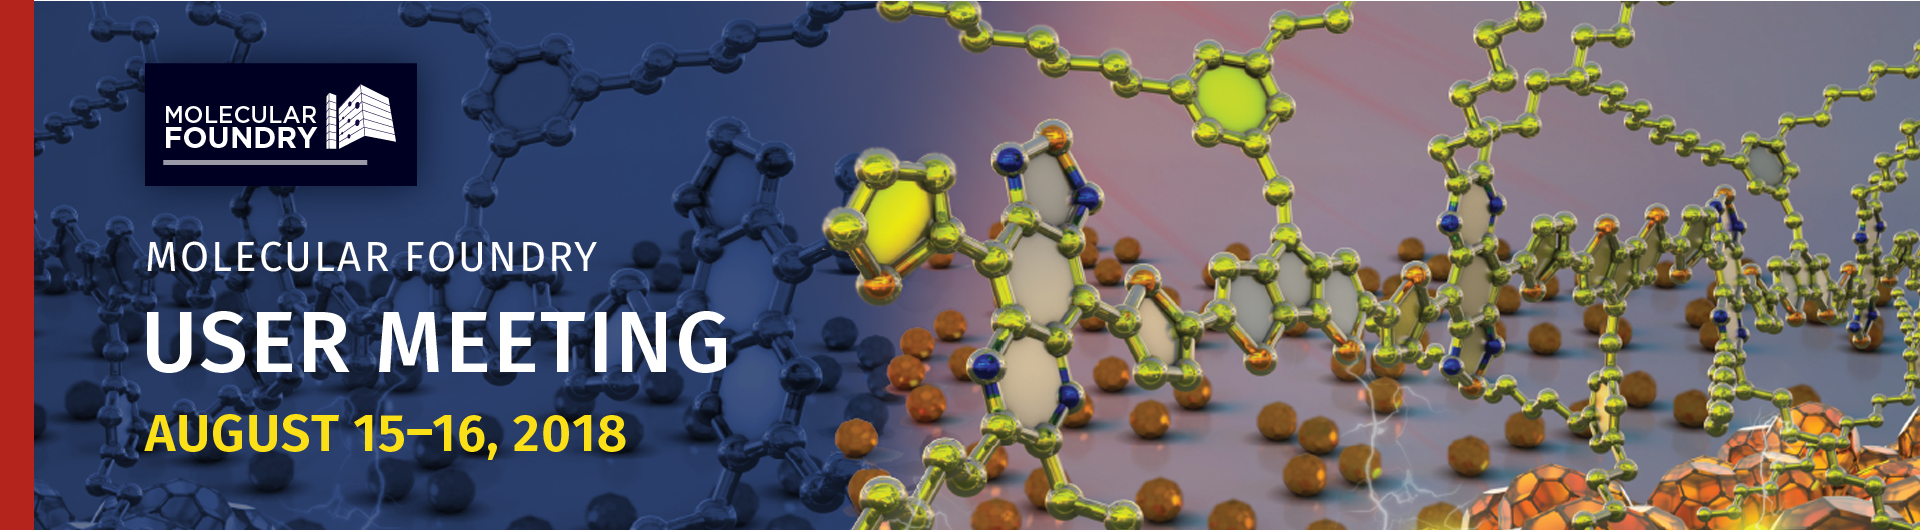 Molecular Foundry 2018 Annual User Meeting